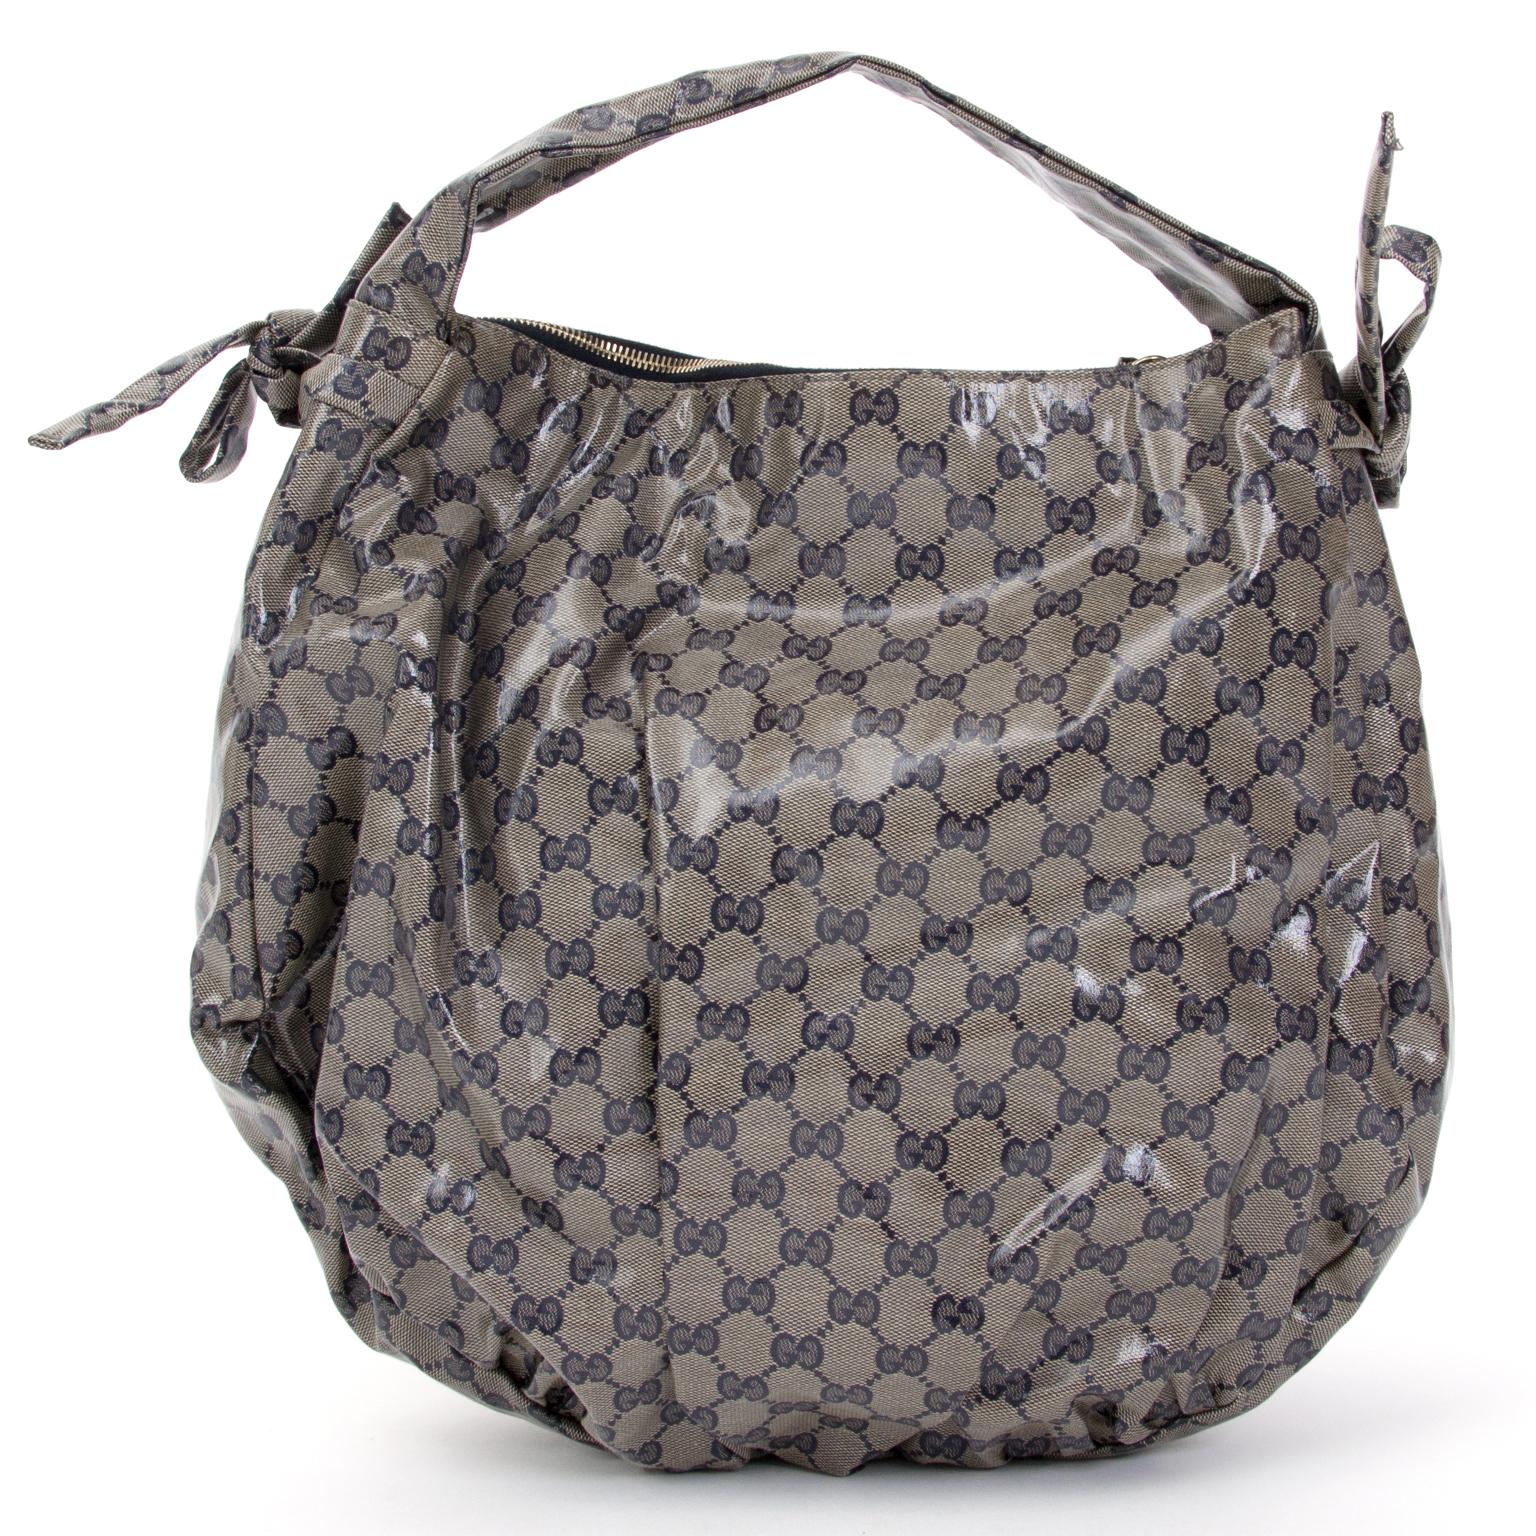 buy safe online second hand designer Gucci Hysteria Gg Coated Canvas Hobo Bag